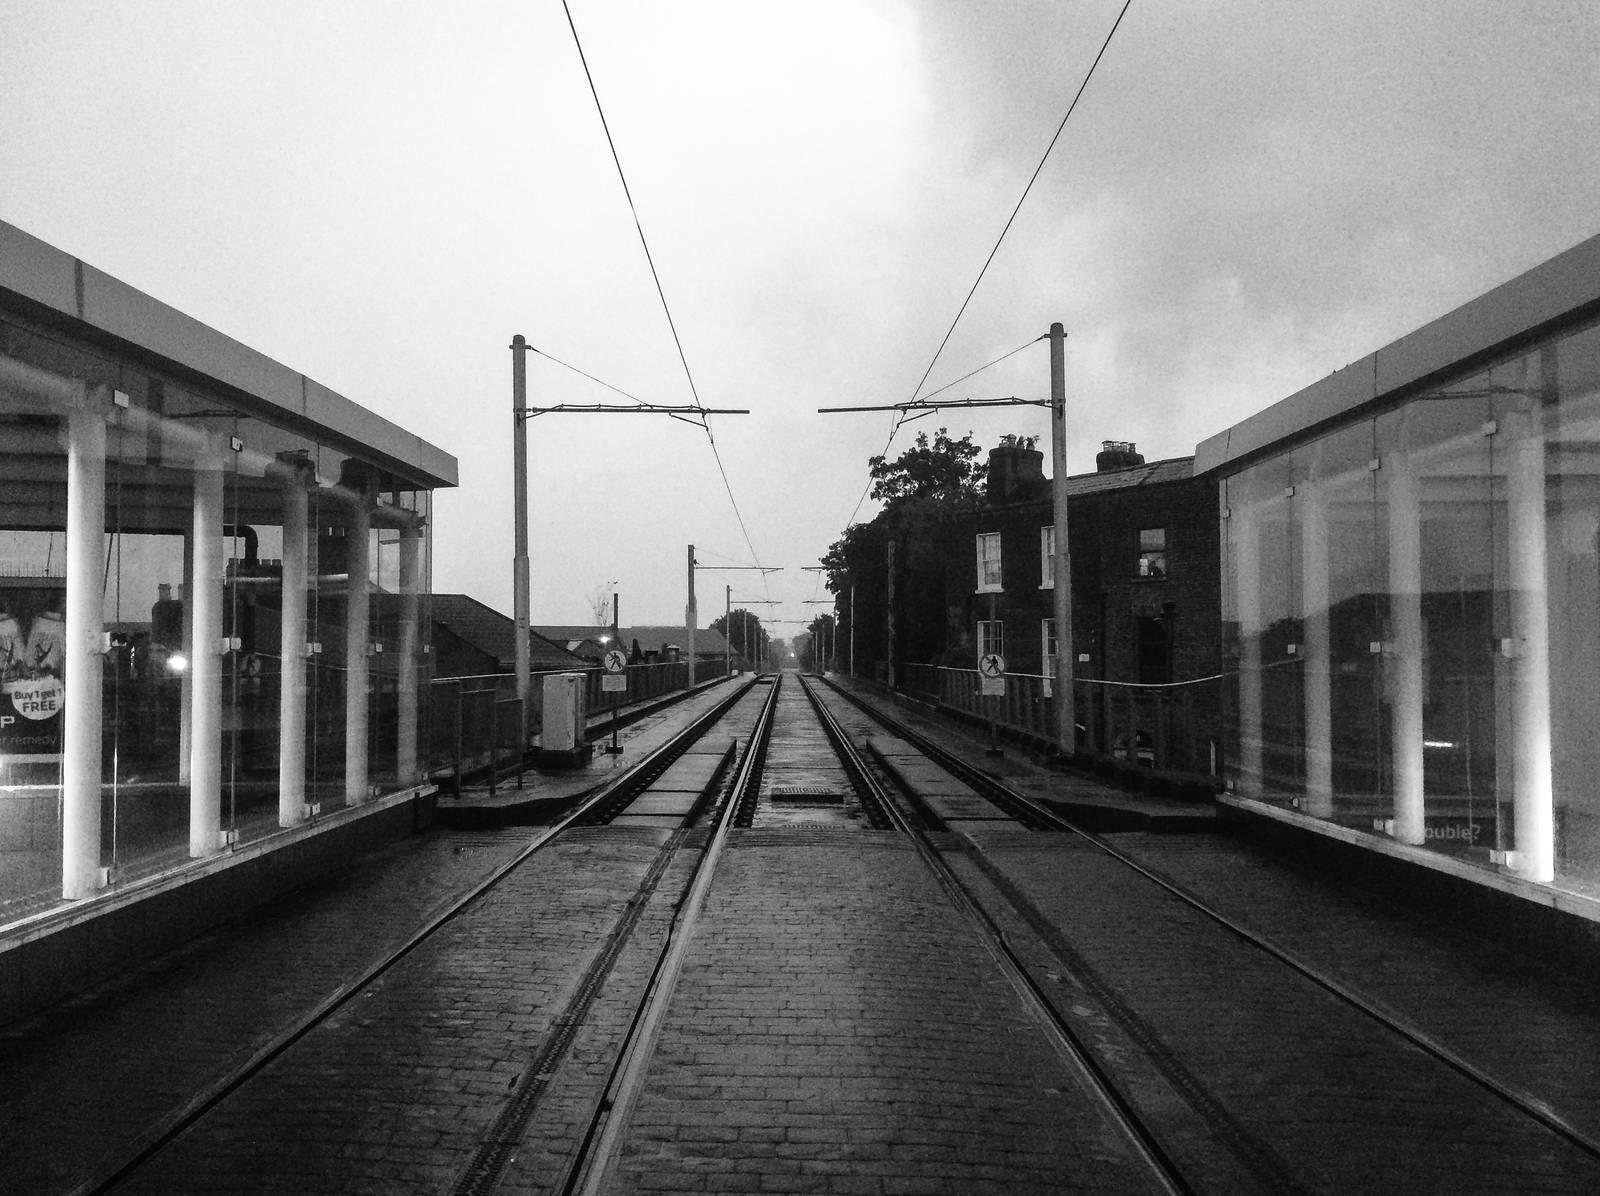 Rainy Luas platform at Ranelagh